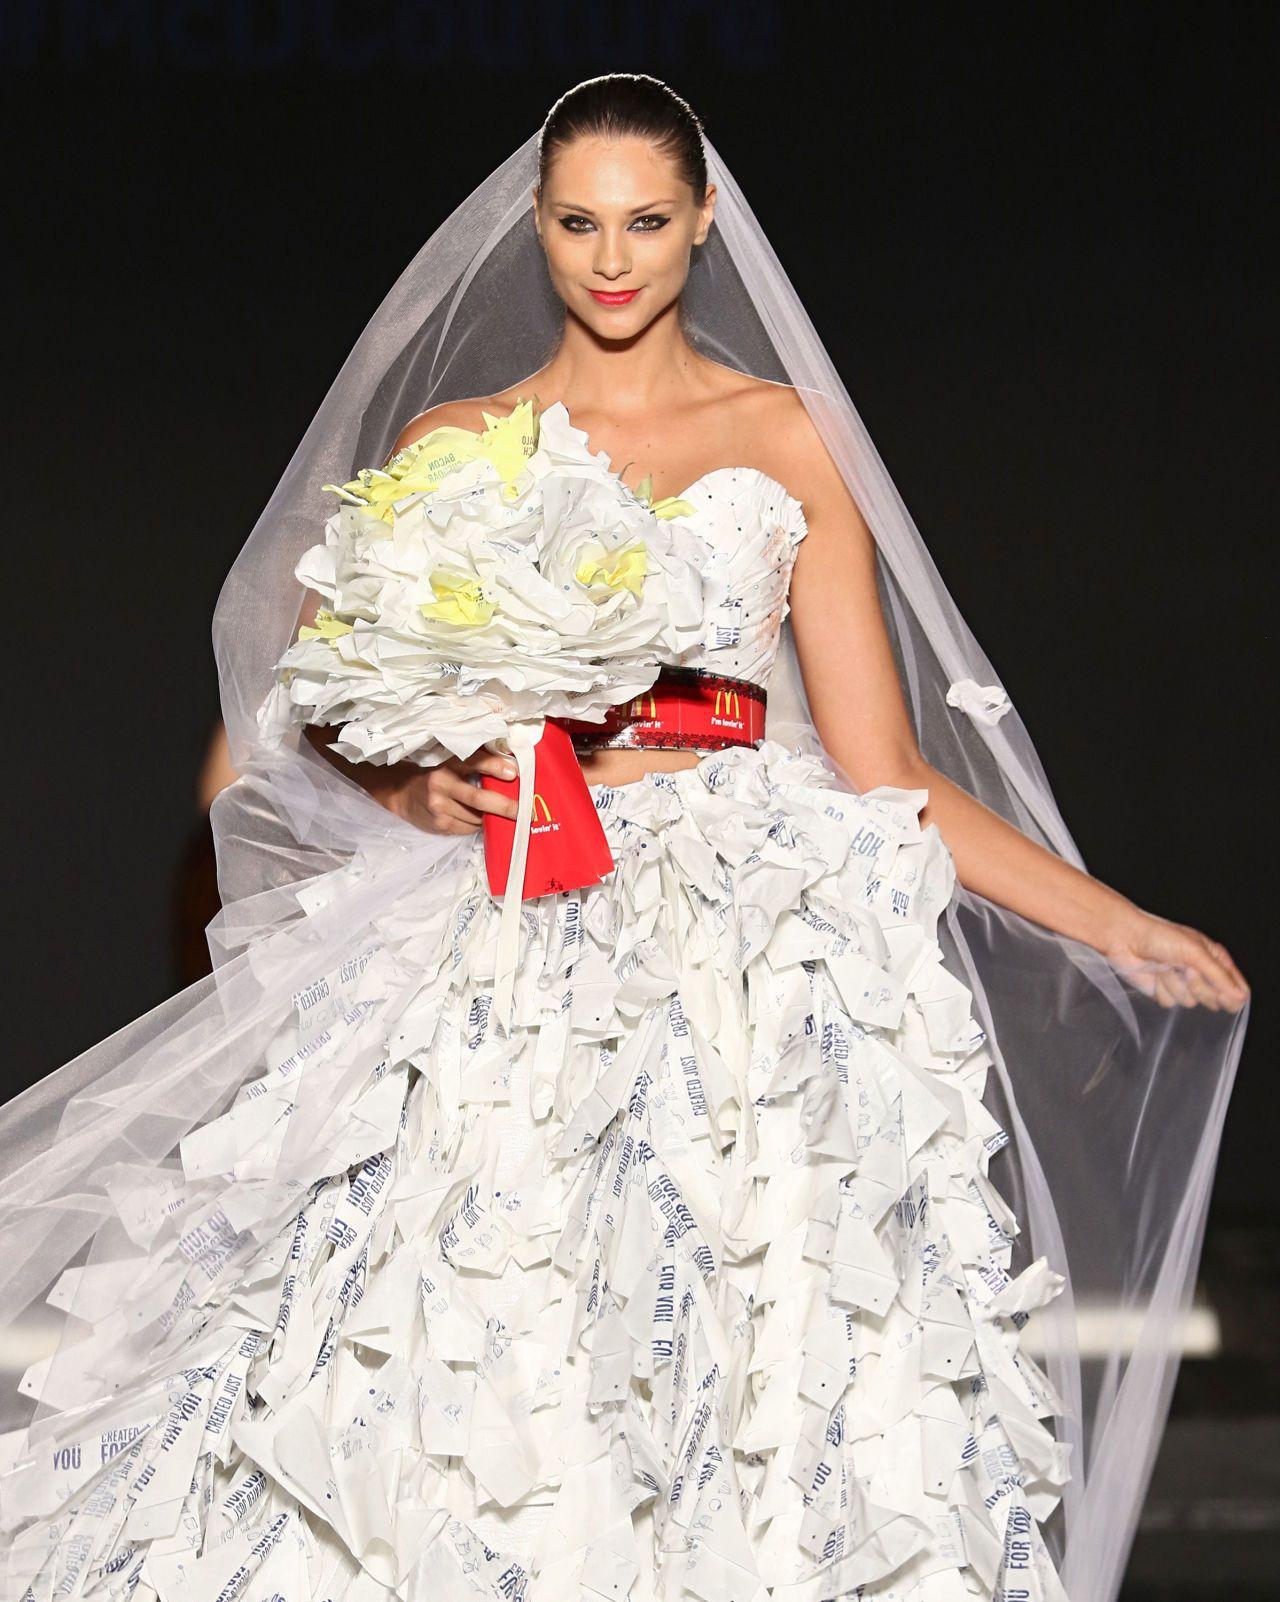 Handkerchiefs From Moms Old Wedding Dress Repurpose Wedding Dress Wedding Dress Keepsake Upcycled Wedding Dress